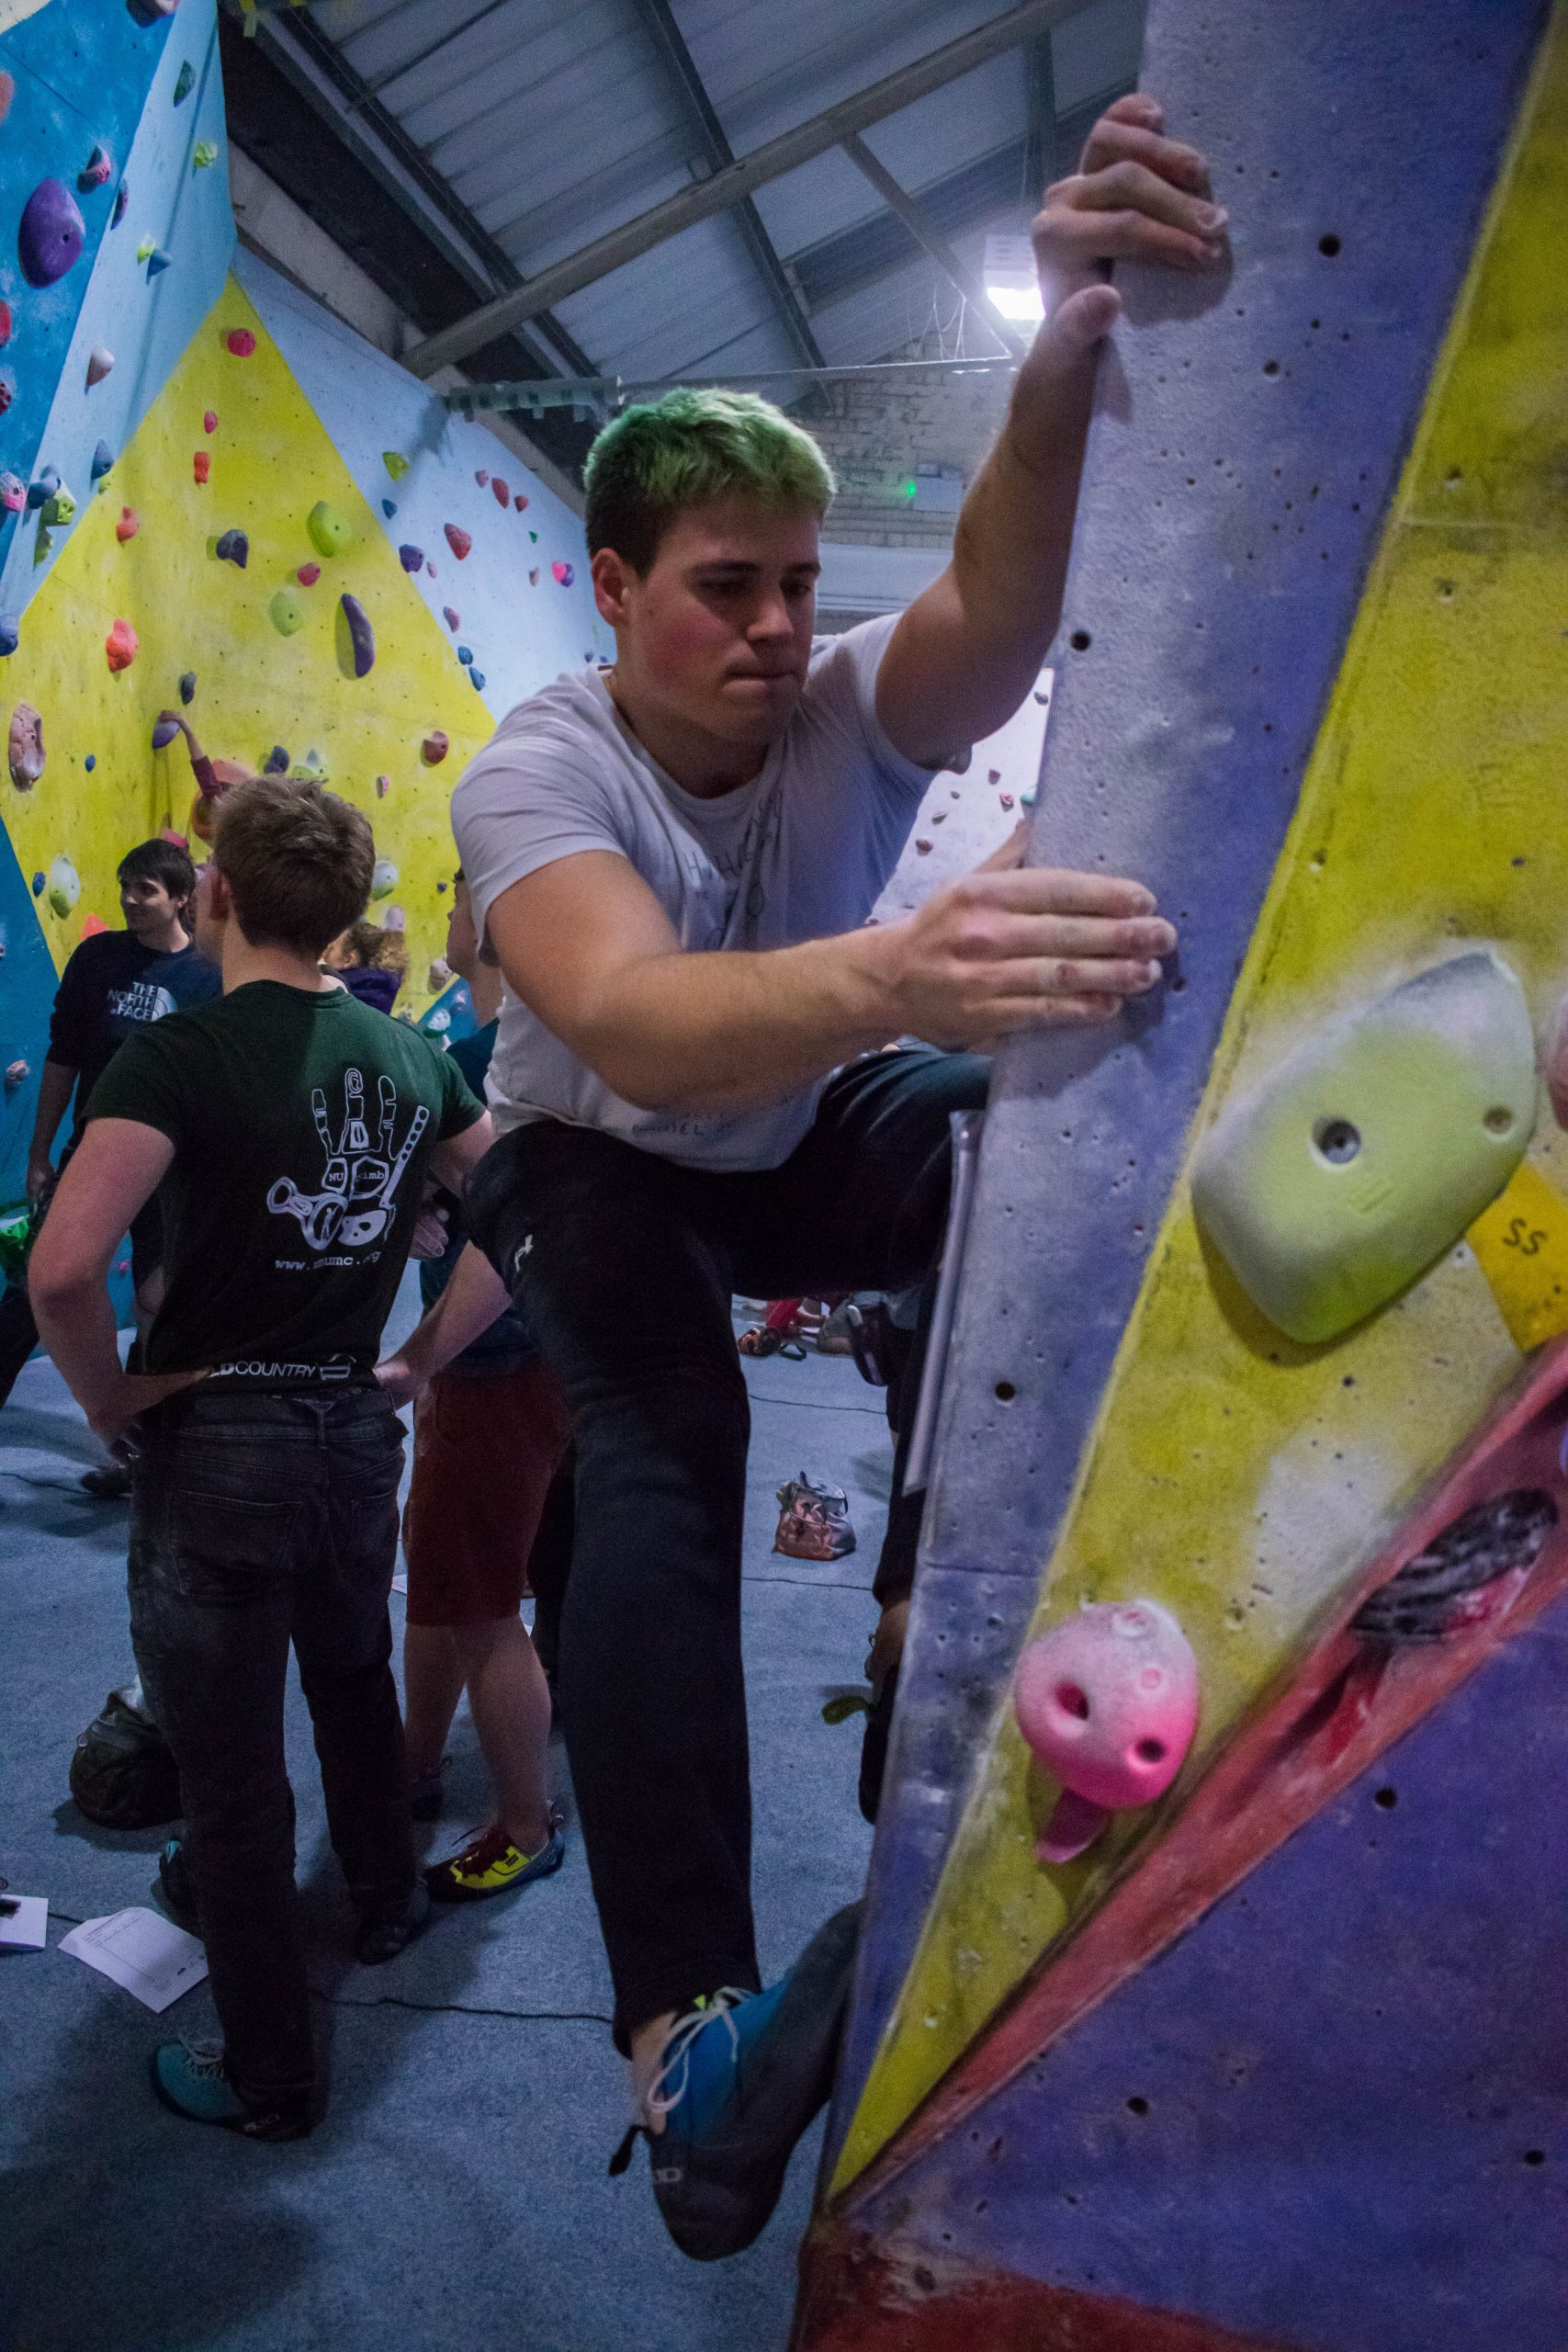 Climber on crescent arete